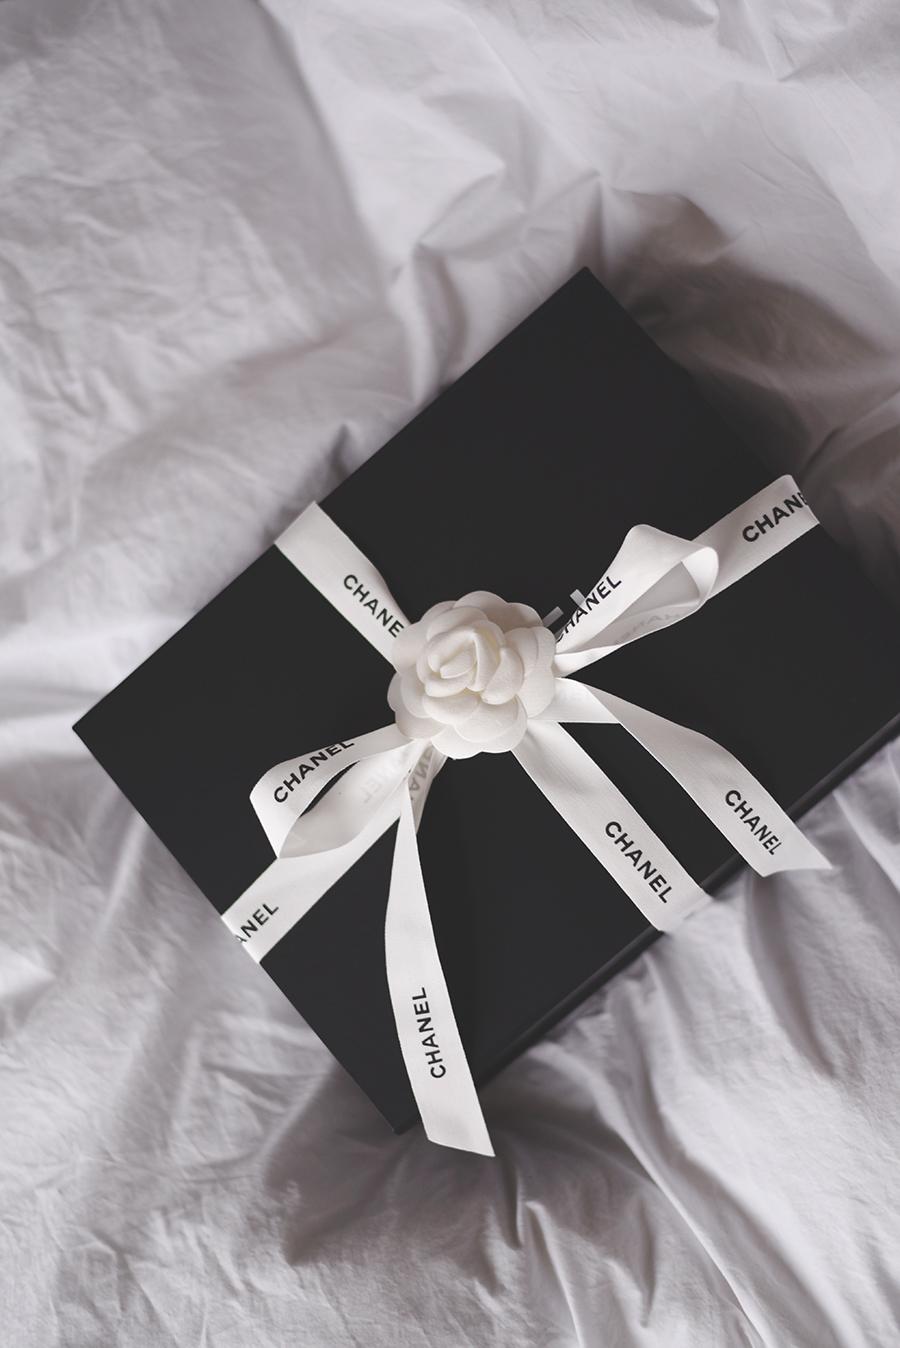 chanel box